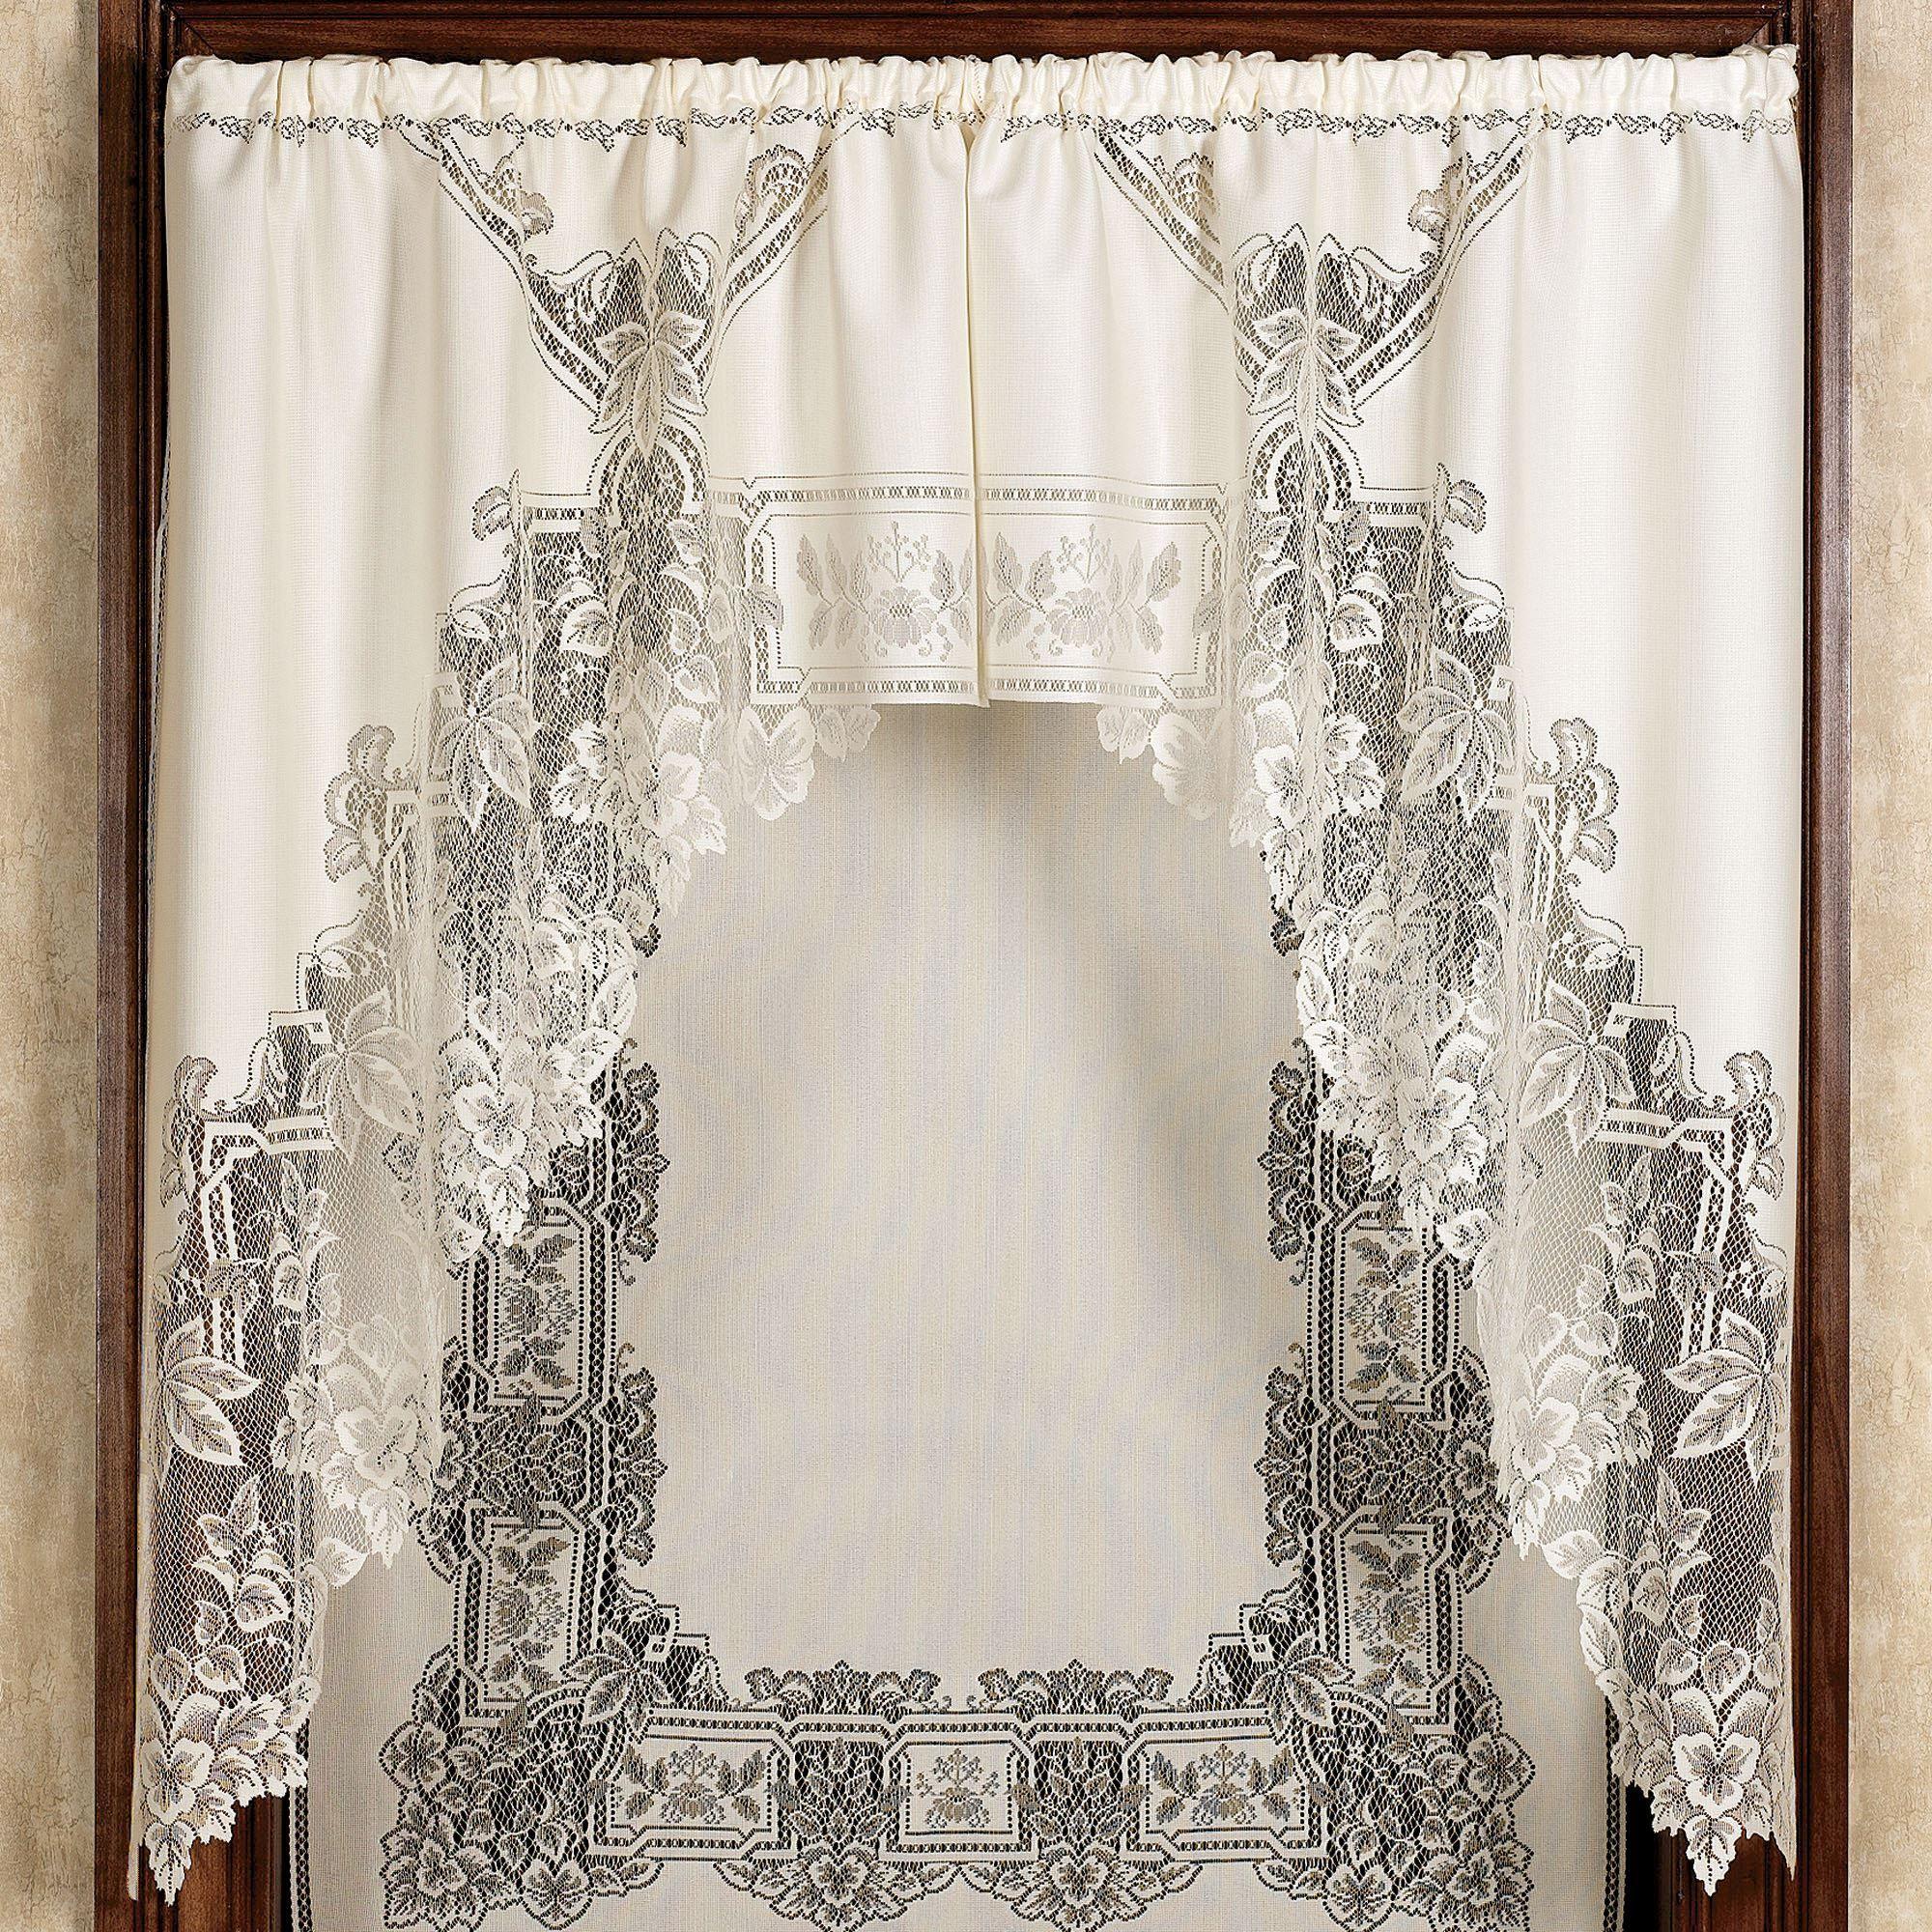 tommy plan catalina cottage inspirational ideas bahama curtains throughout liner house vast fridgemountain shower curtain